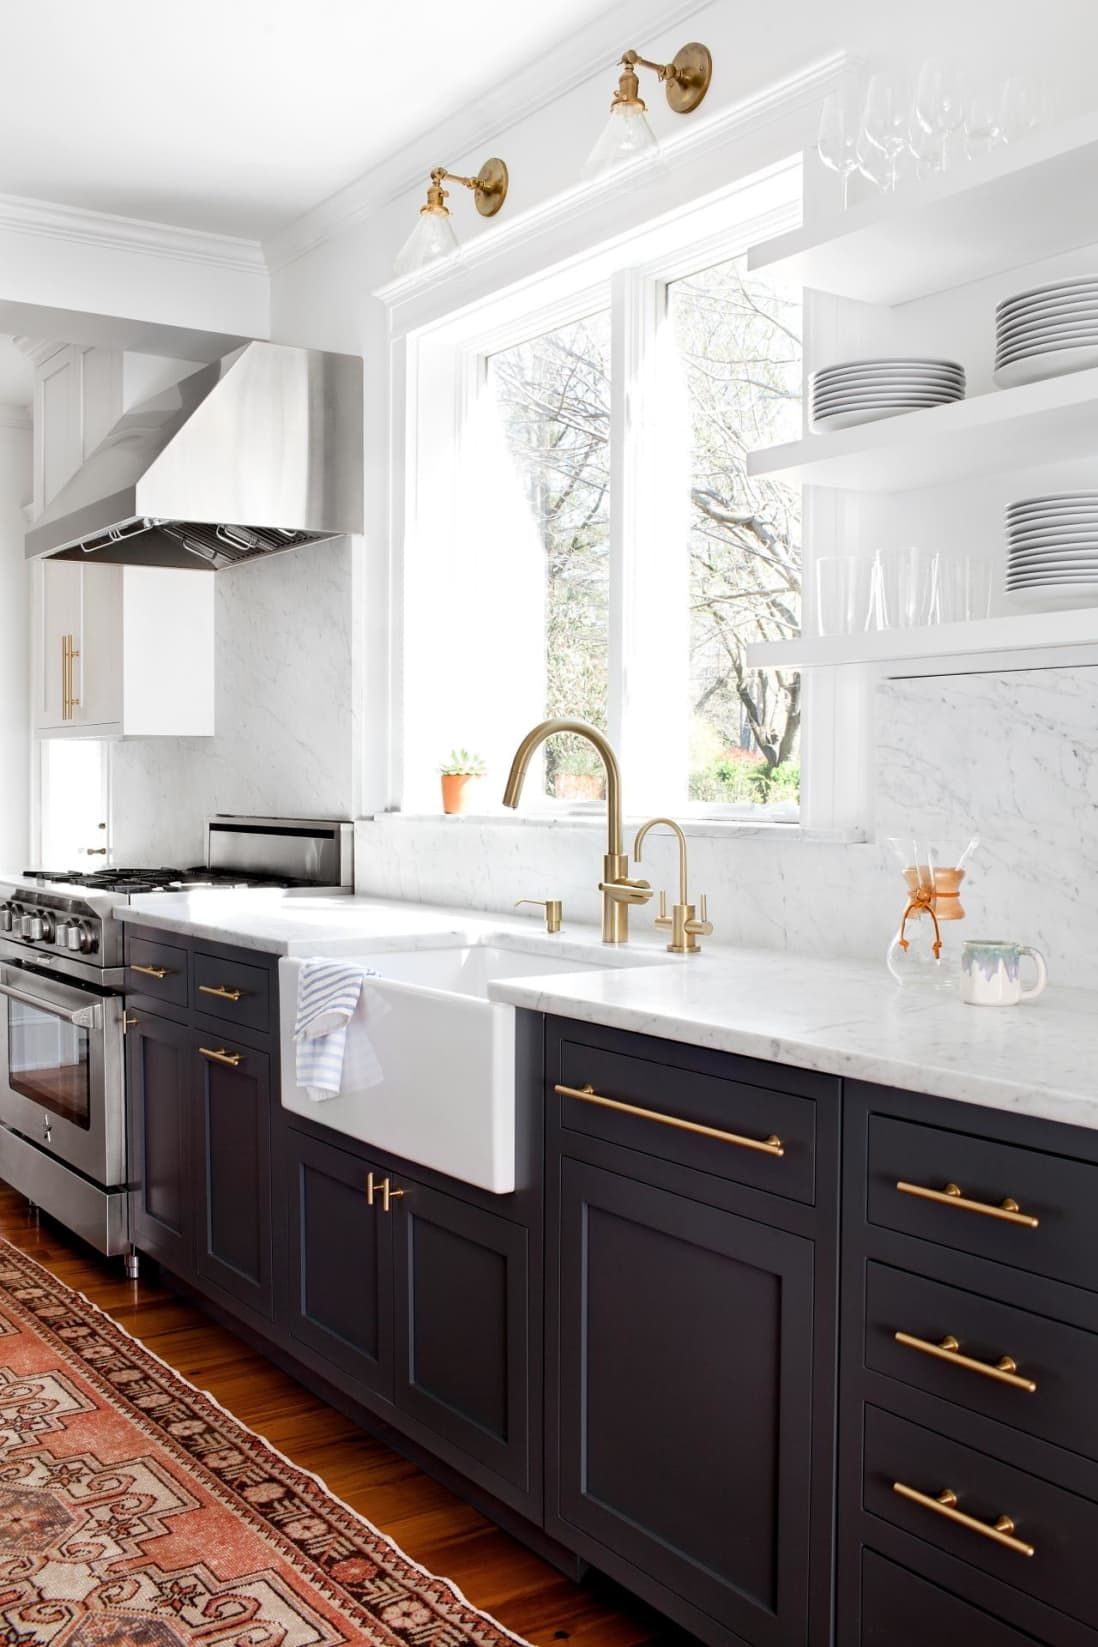 Beyaz Mutfak Dolap Modelleri Ile Benzersiz Tasarimlar Blue Kitchen Cabinets Kitchen Renovation Classic Kitchens